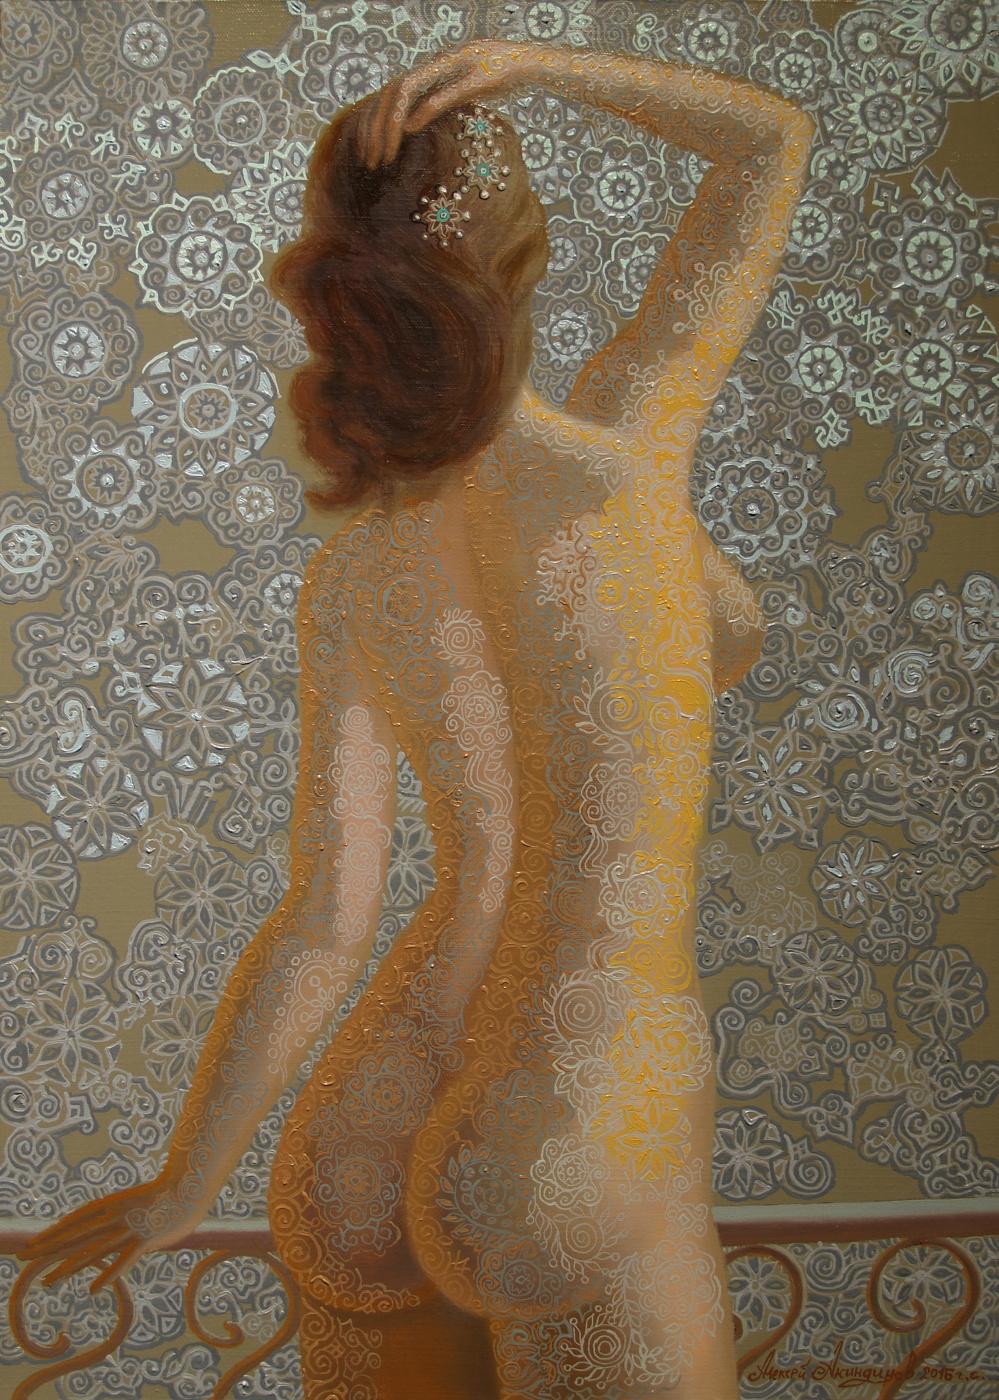 Алексей Петрович Акиндинов. Nude girl, back view